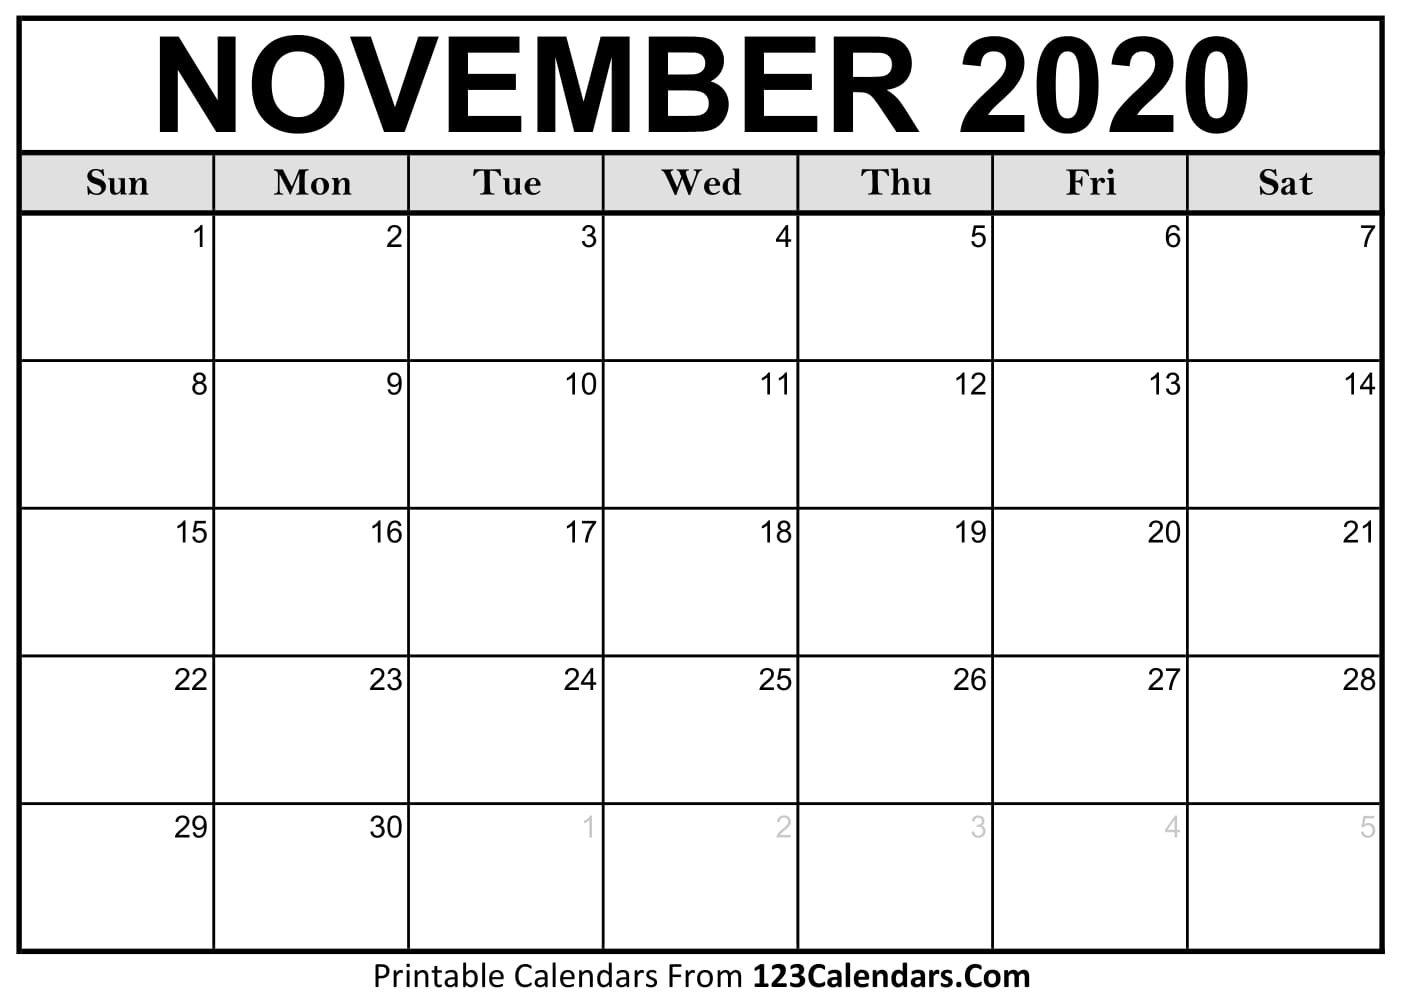 Printable November 2020 Calendar Templates | 123Calendars April Calendar That Can Be Edit